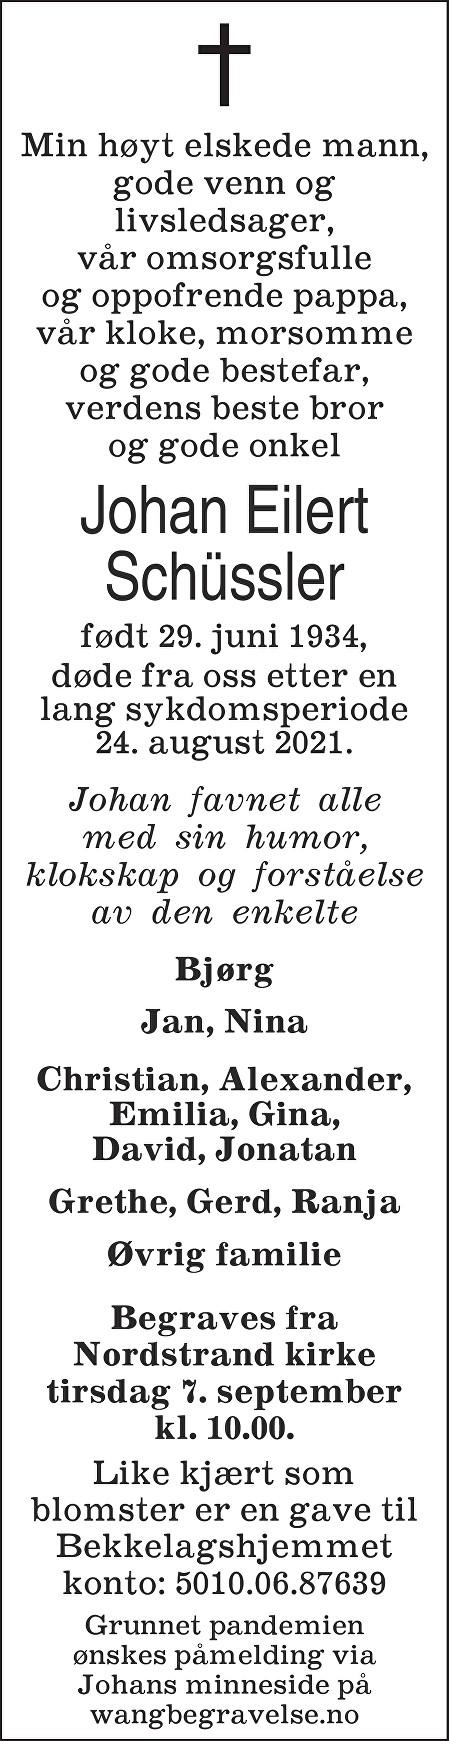 Johan Eilert Schüssler Dødsannonse